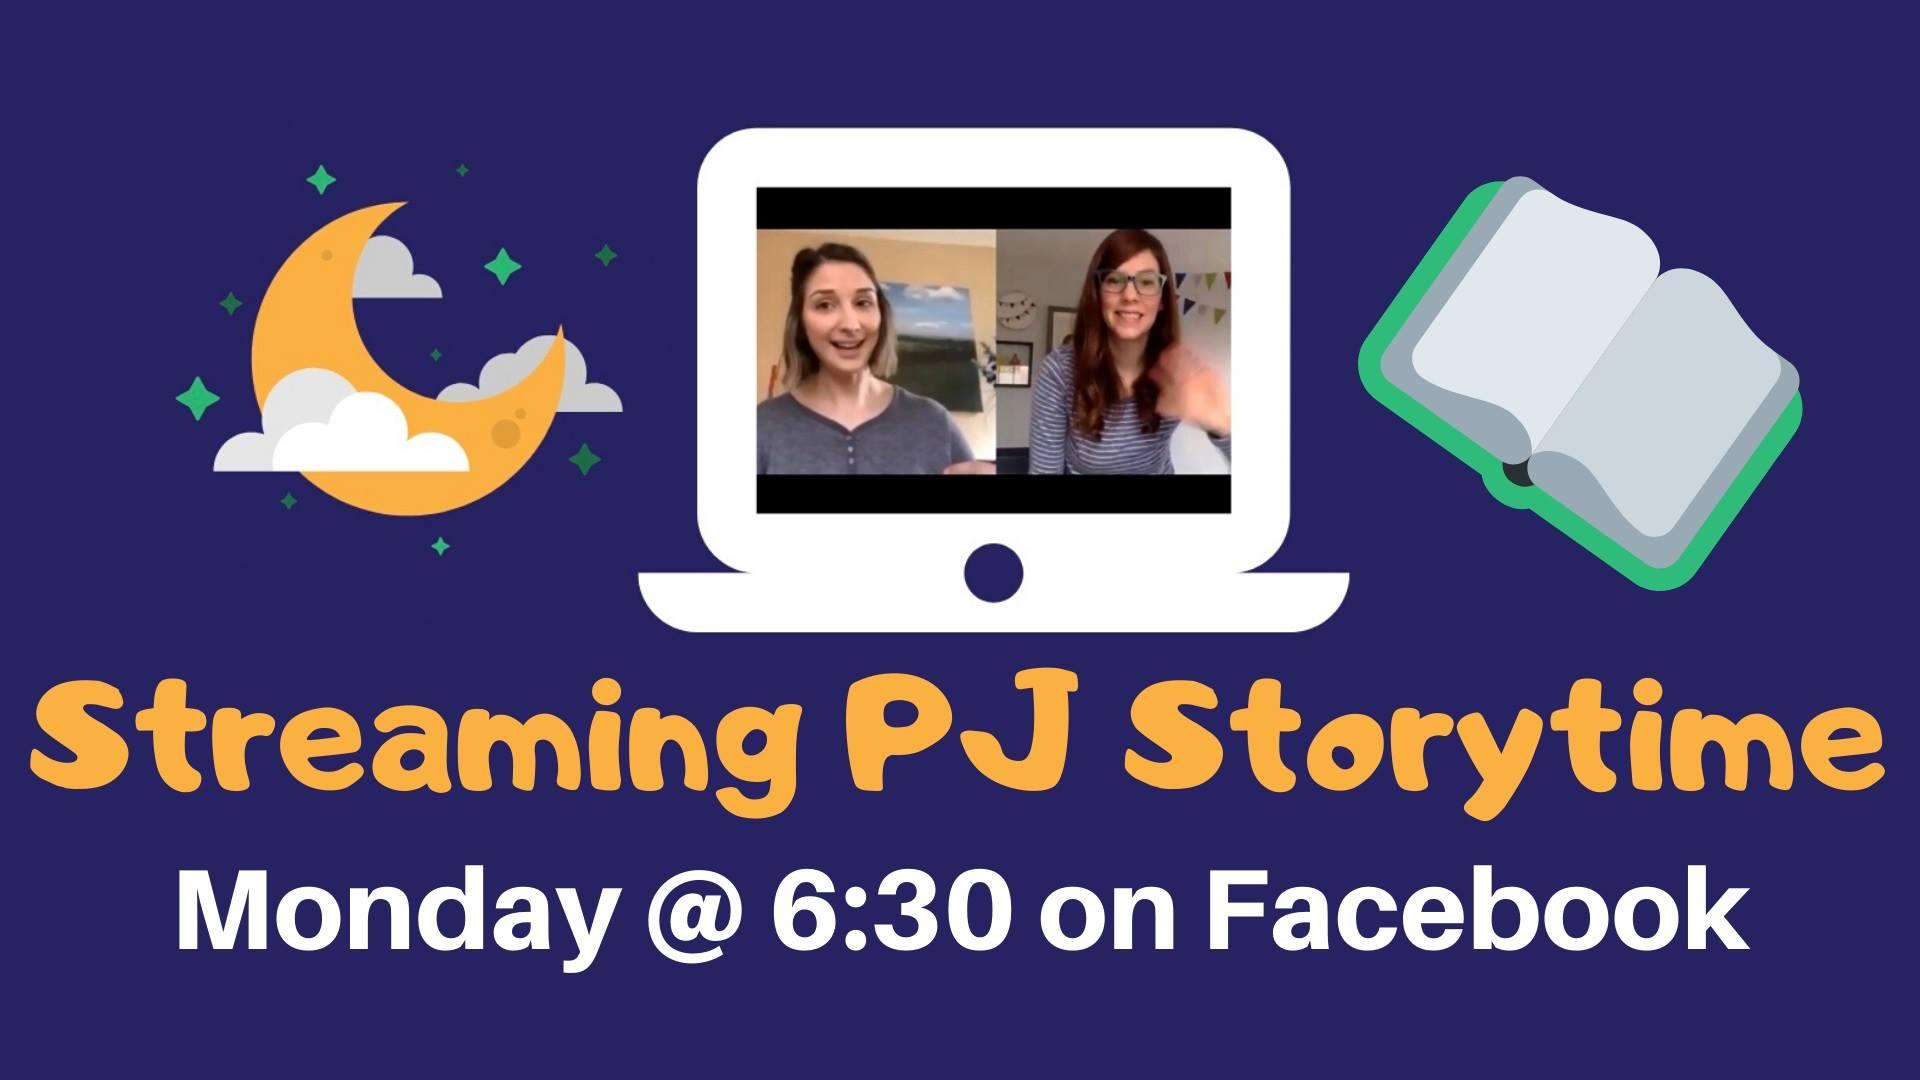 Streaming PJ Storytime (on Facebook)